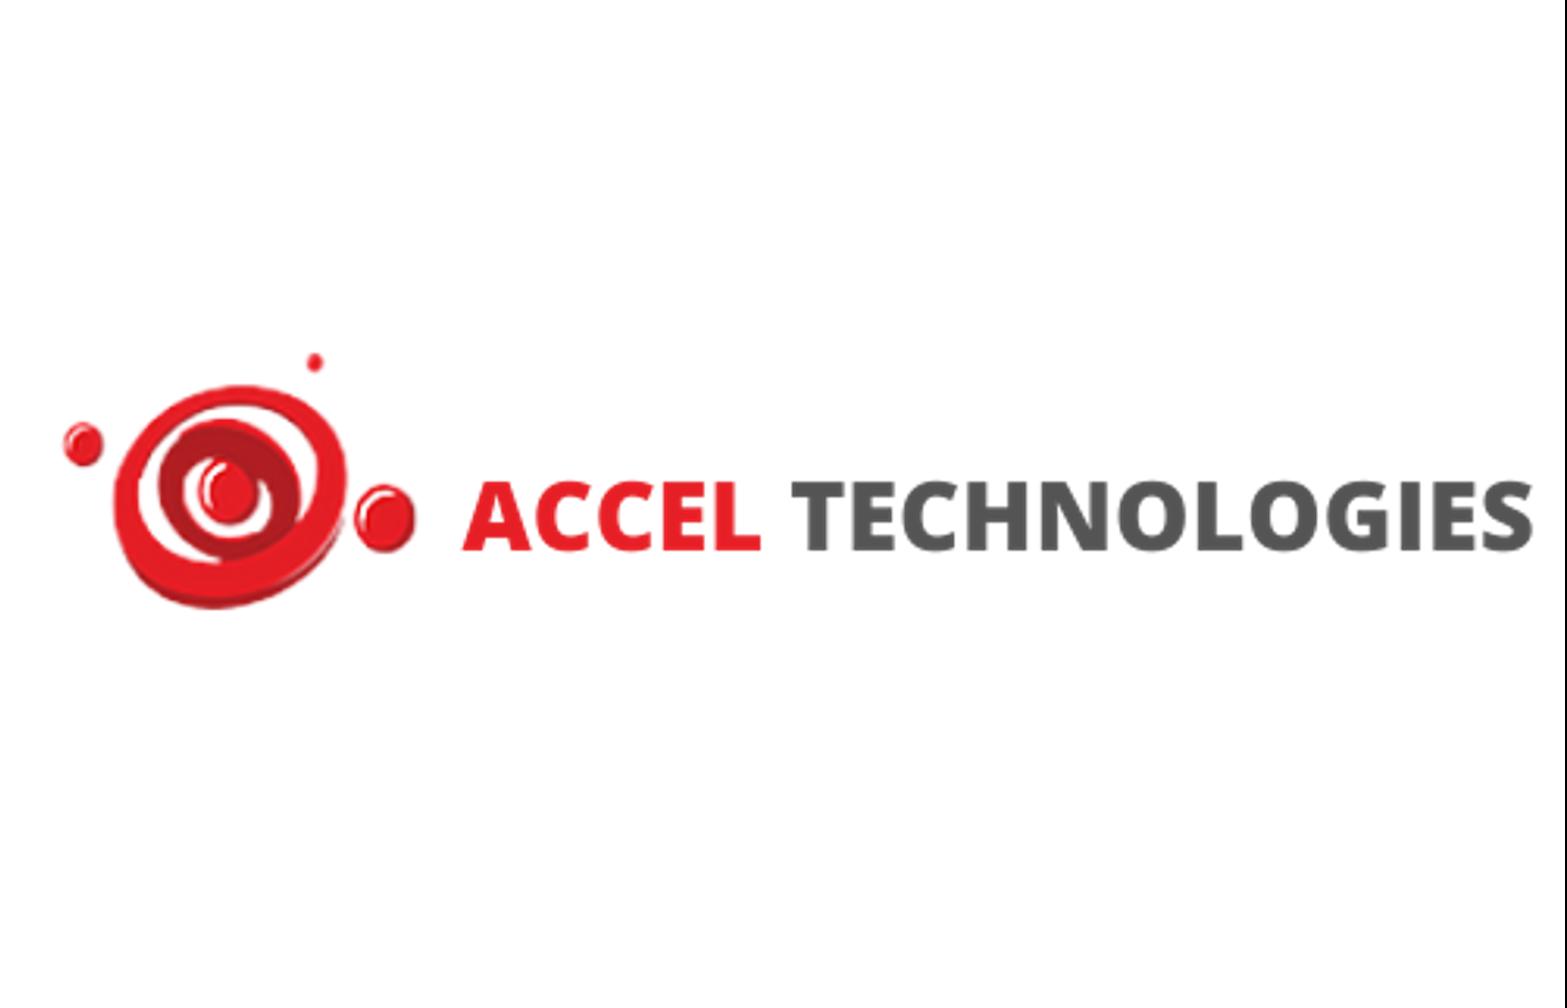 ACCEL TECHNOLOGIES